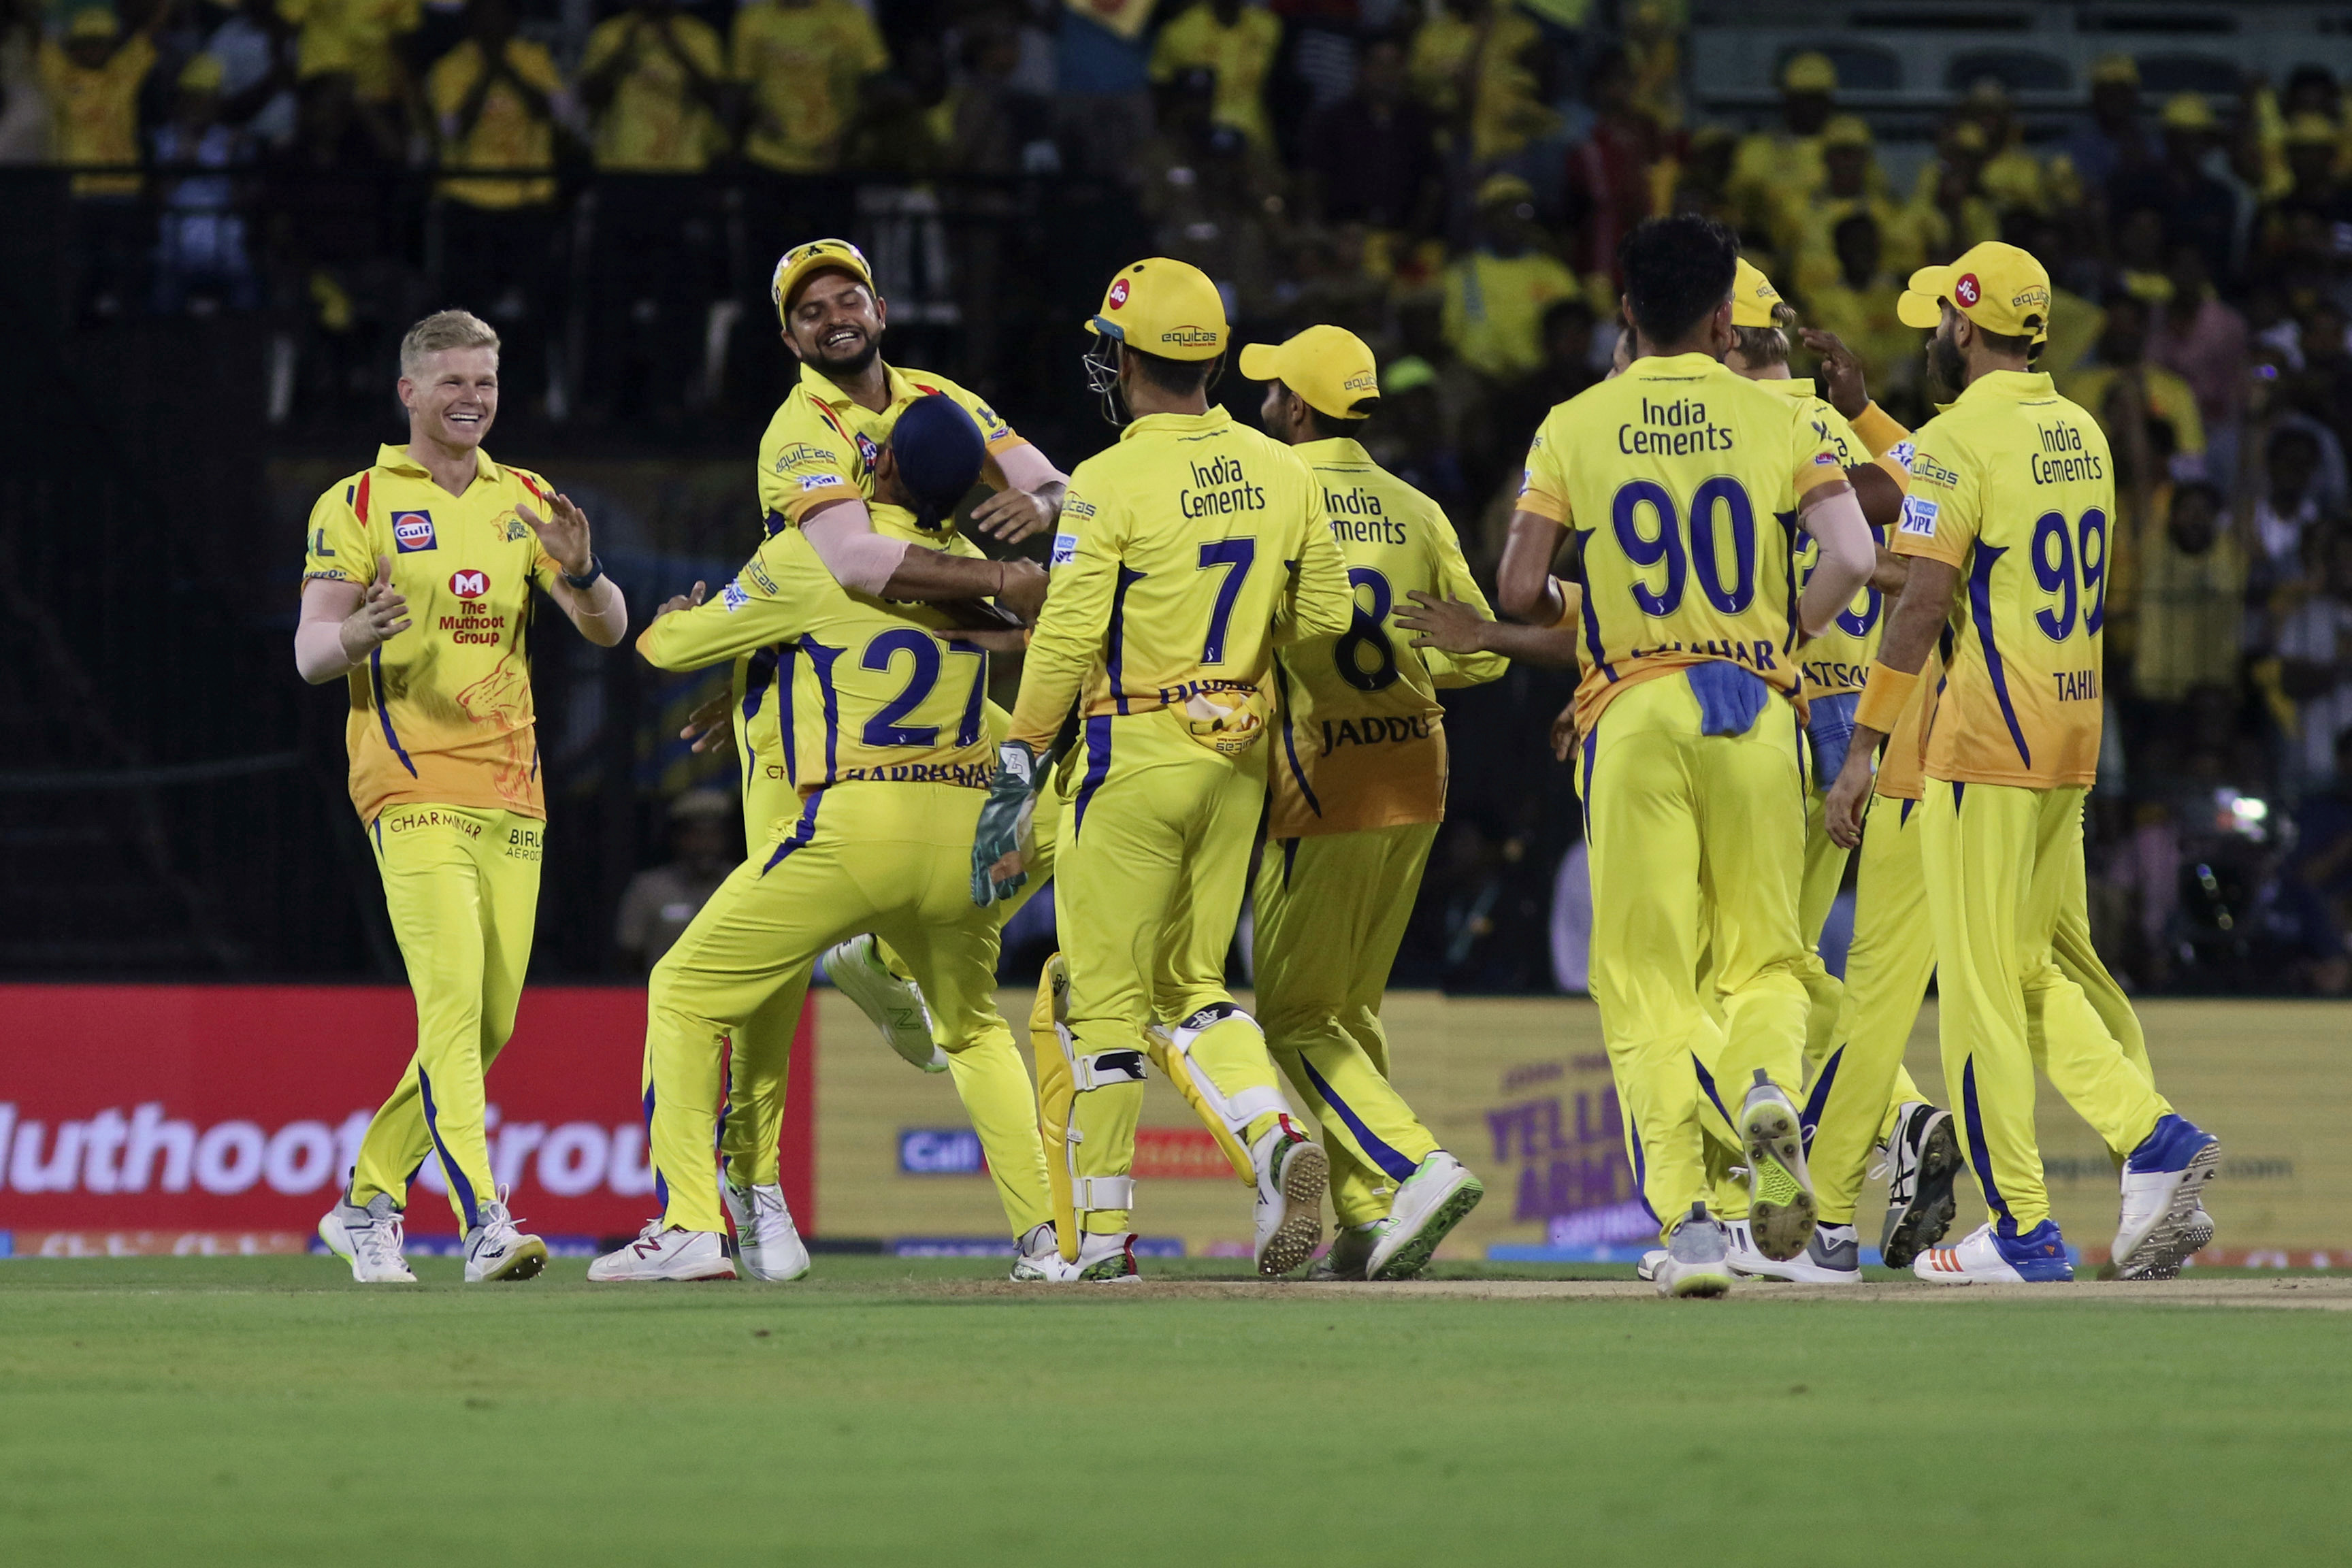 CSK were last year's IPL champions